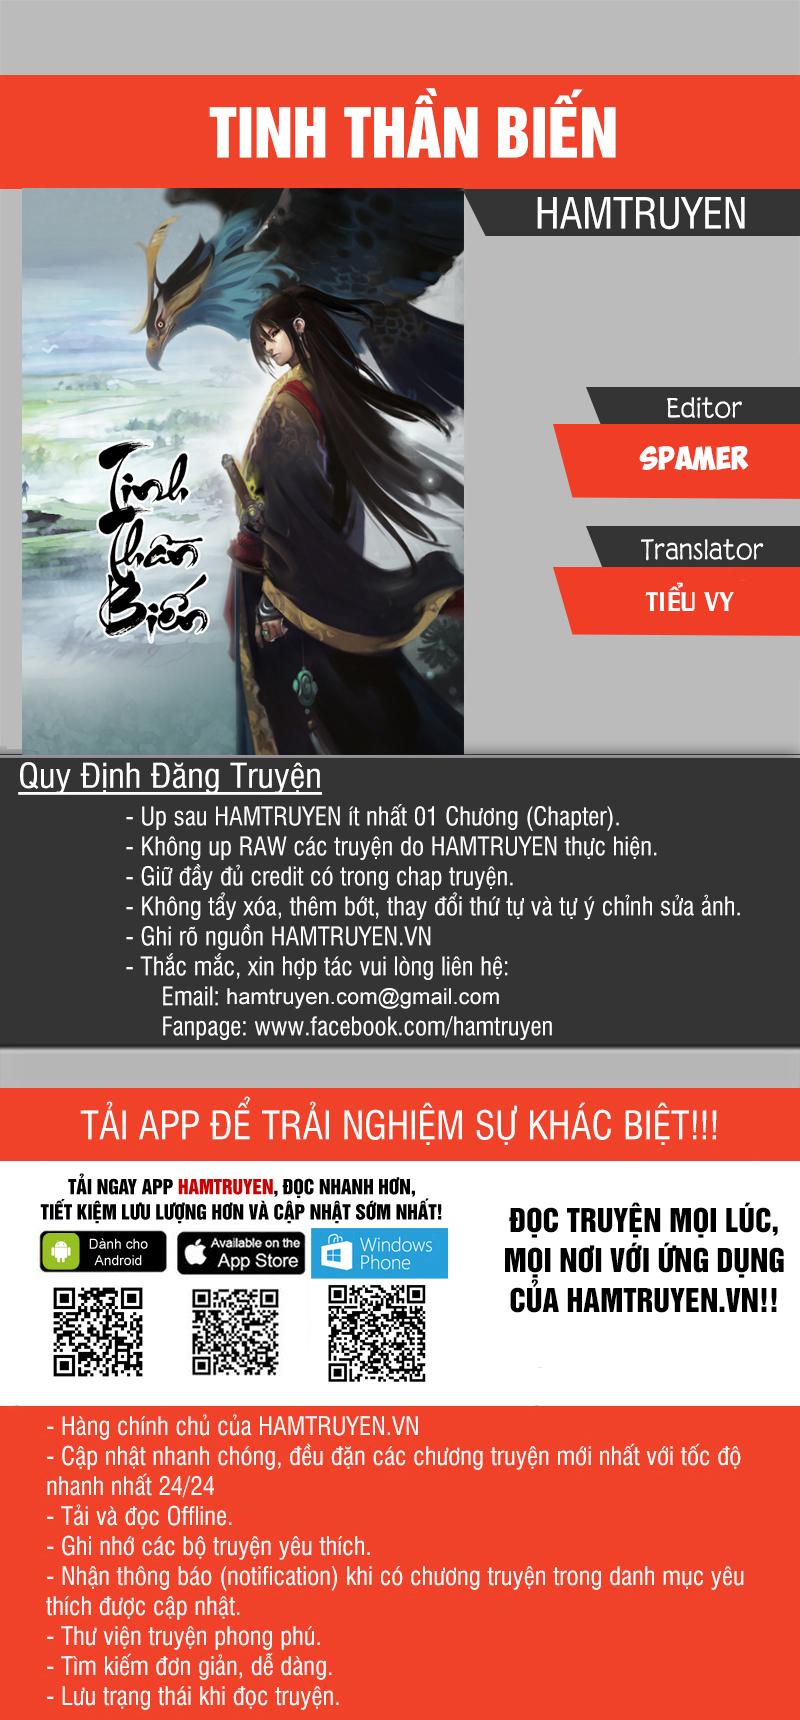 Tinh Thần Biến Chapter 447 - Upload bởi truyensieuhay.com